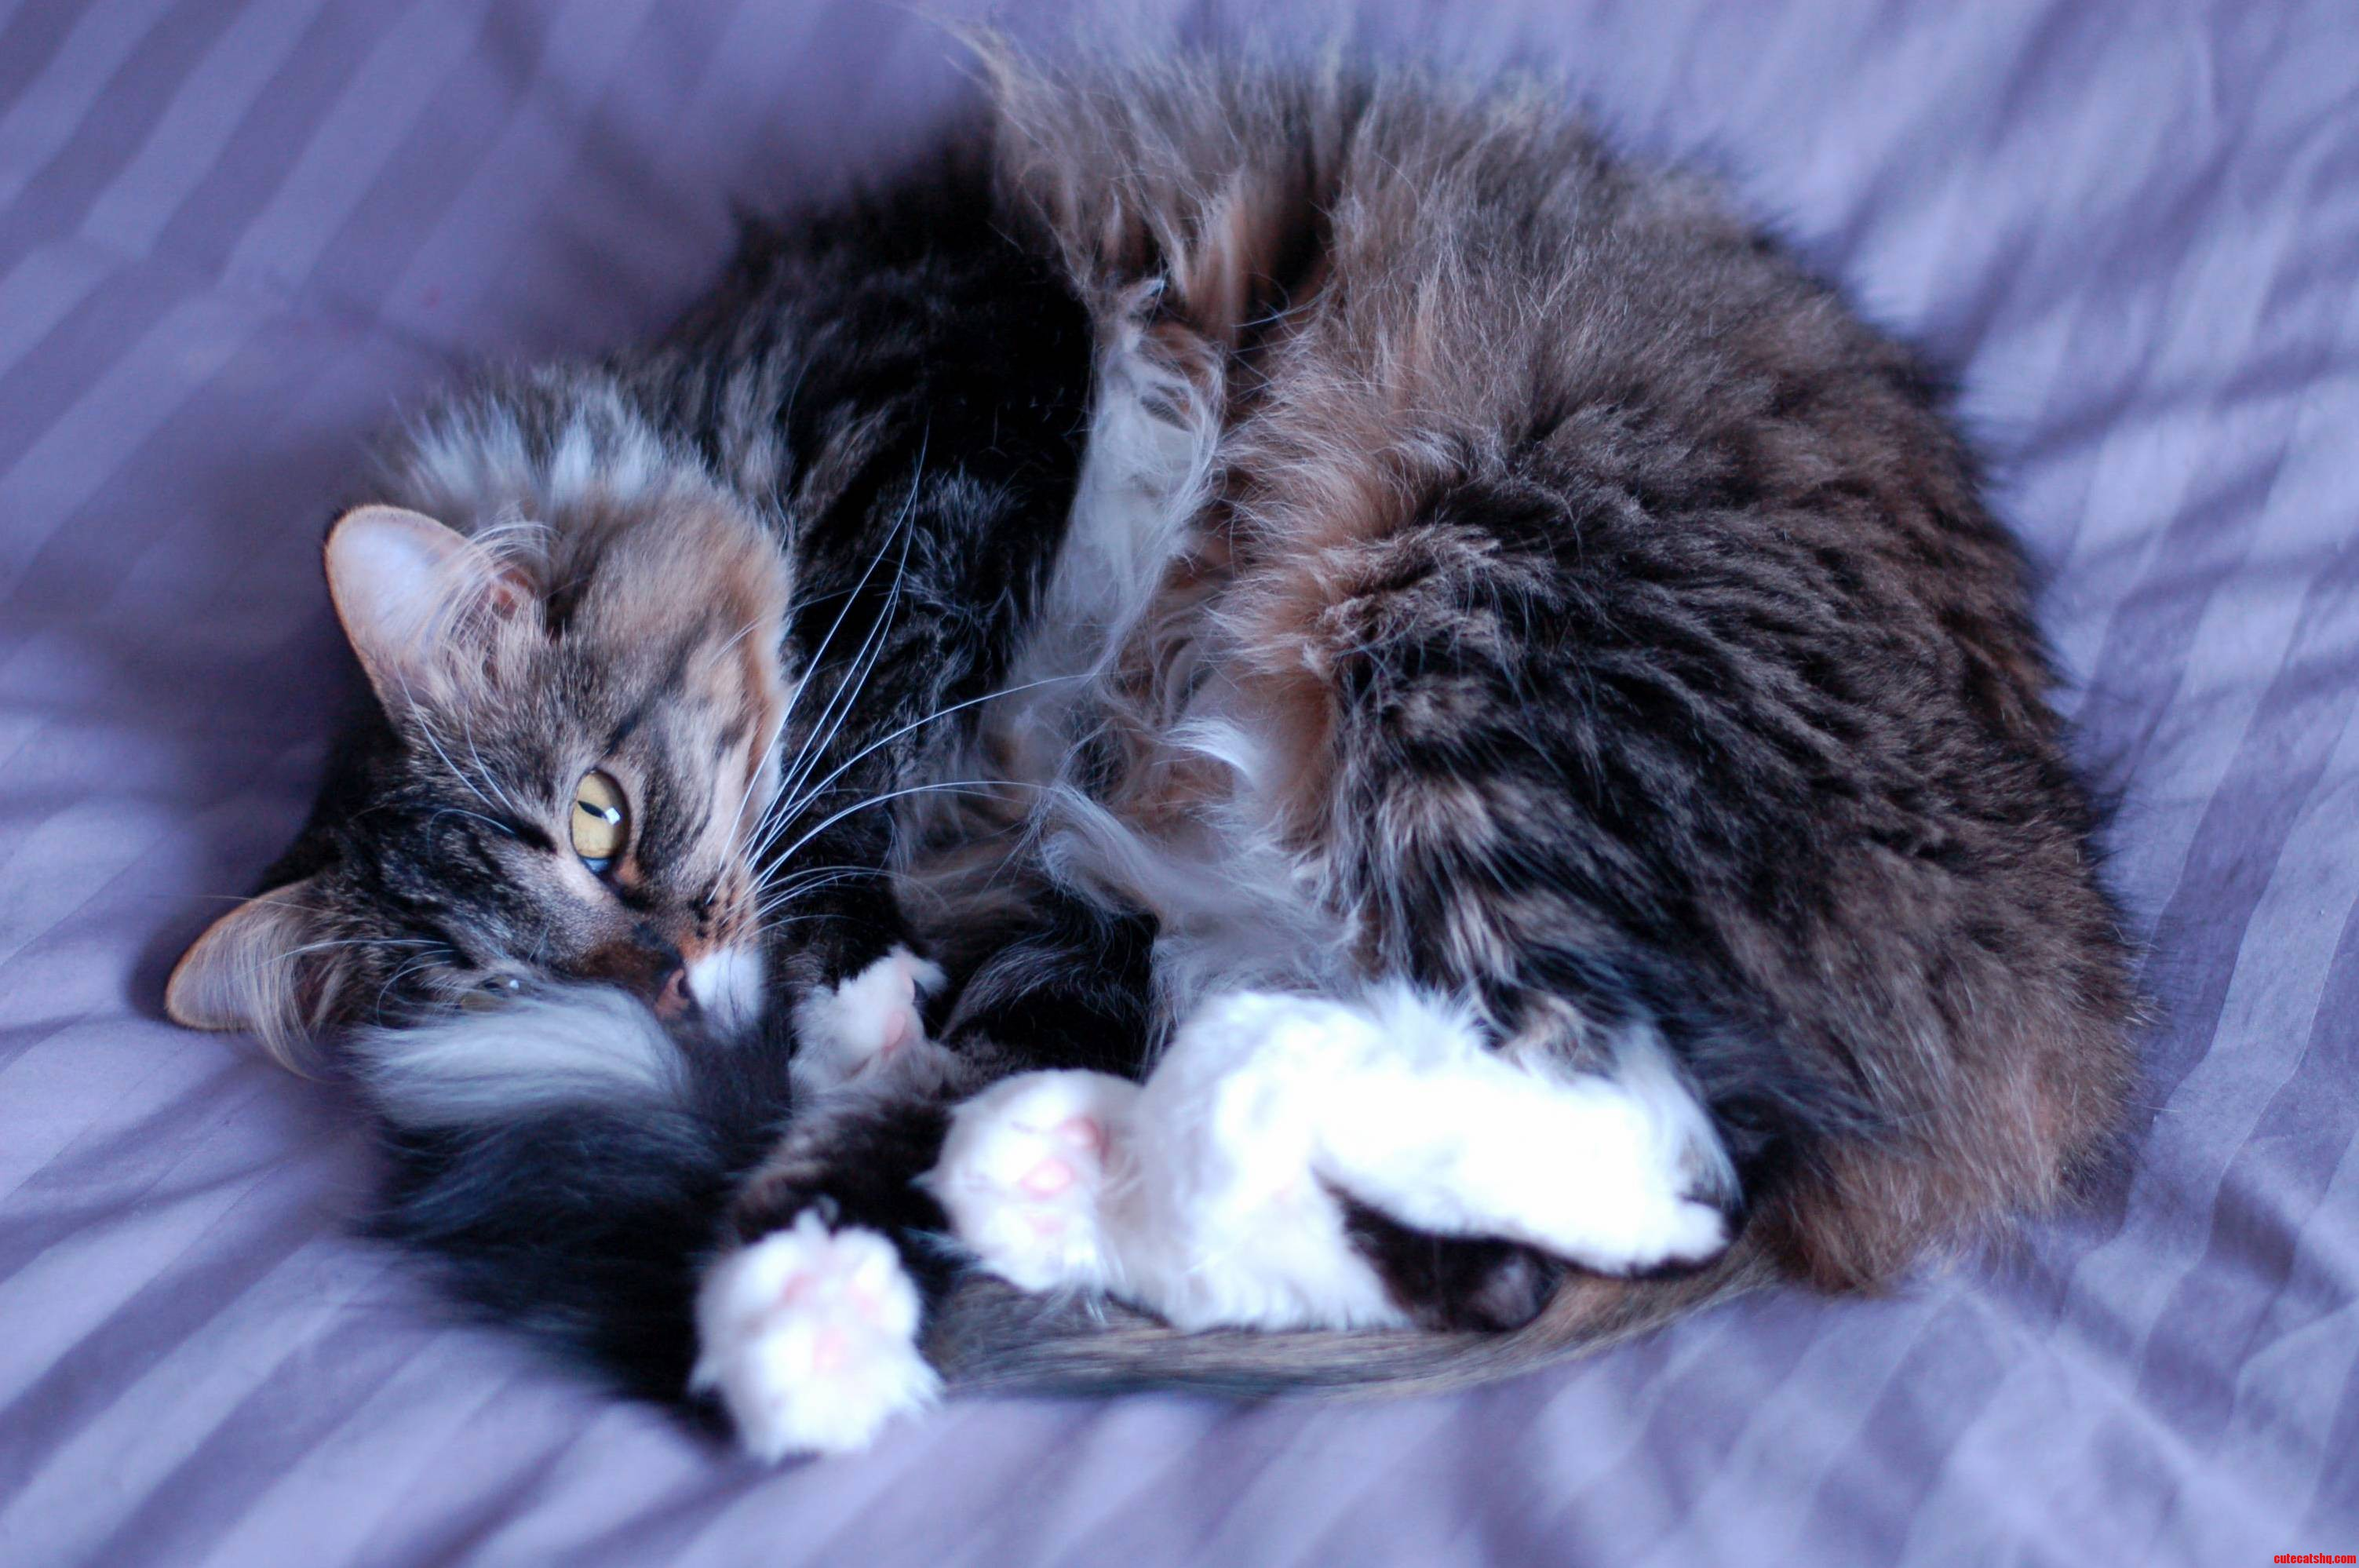 Irresistible snuggles